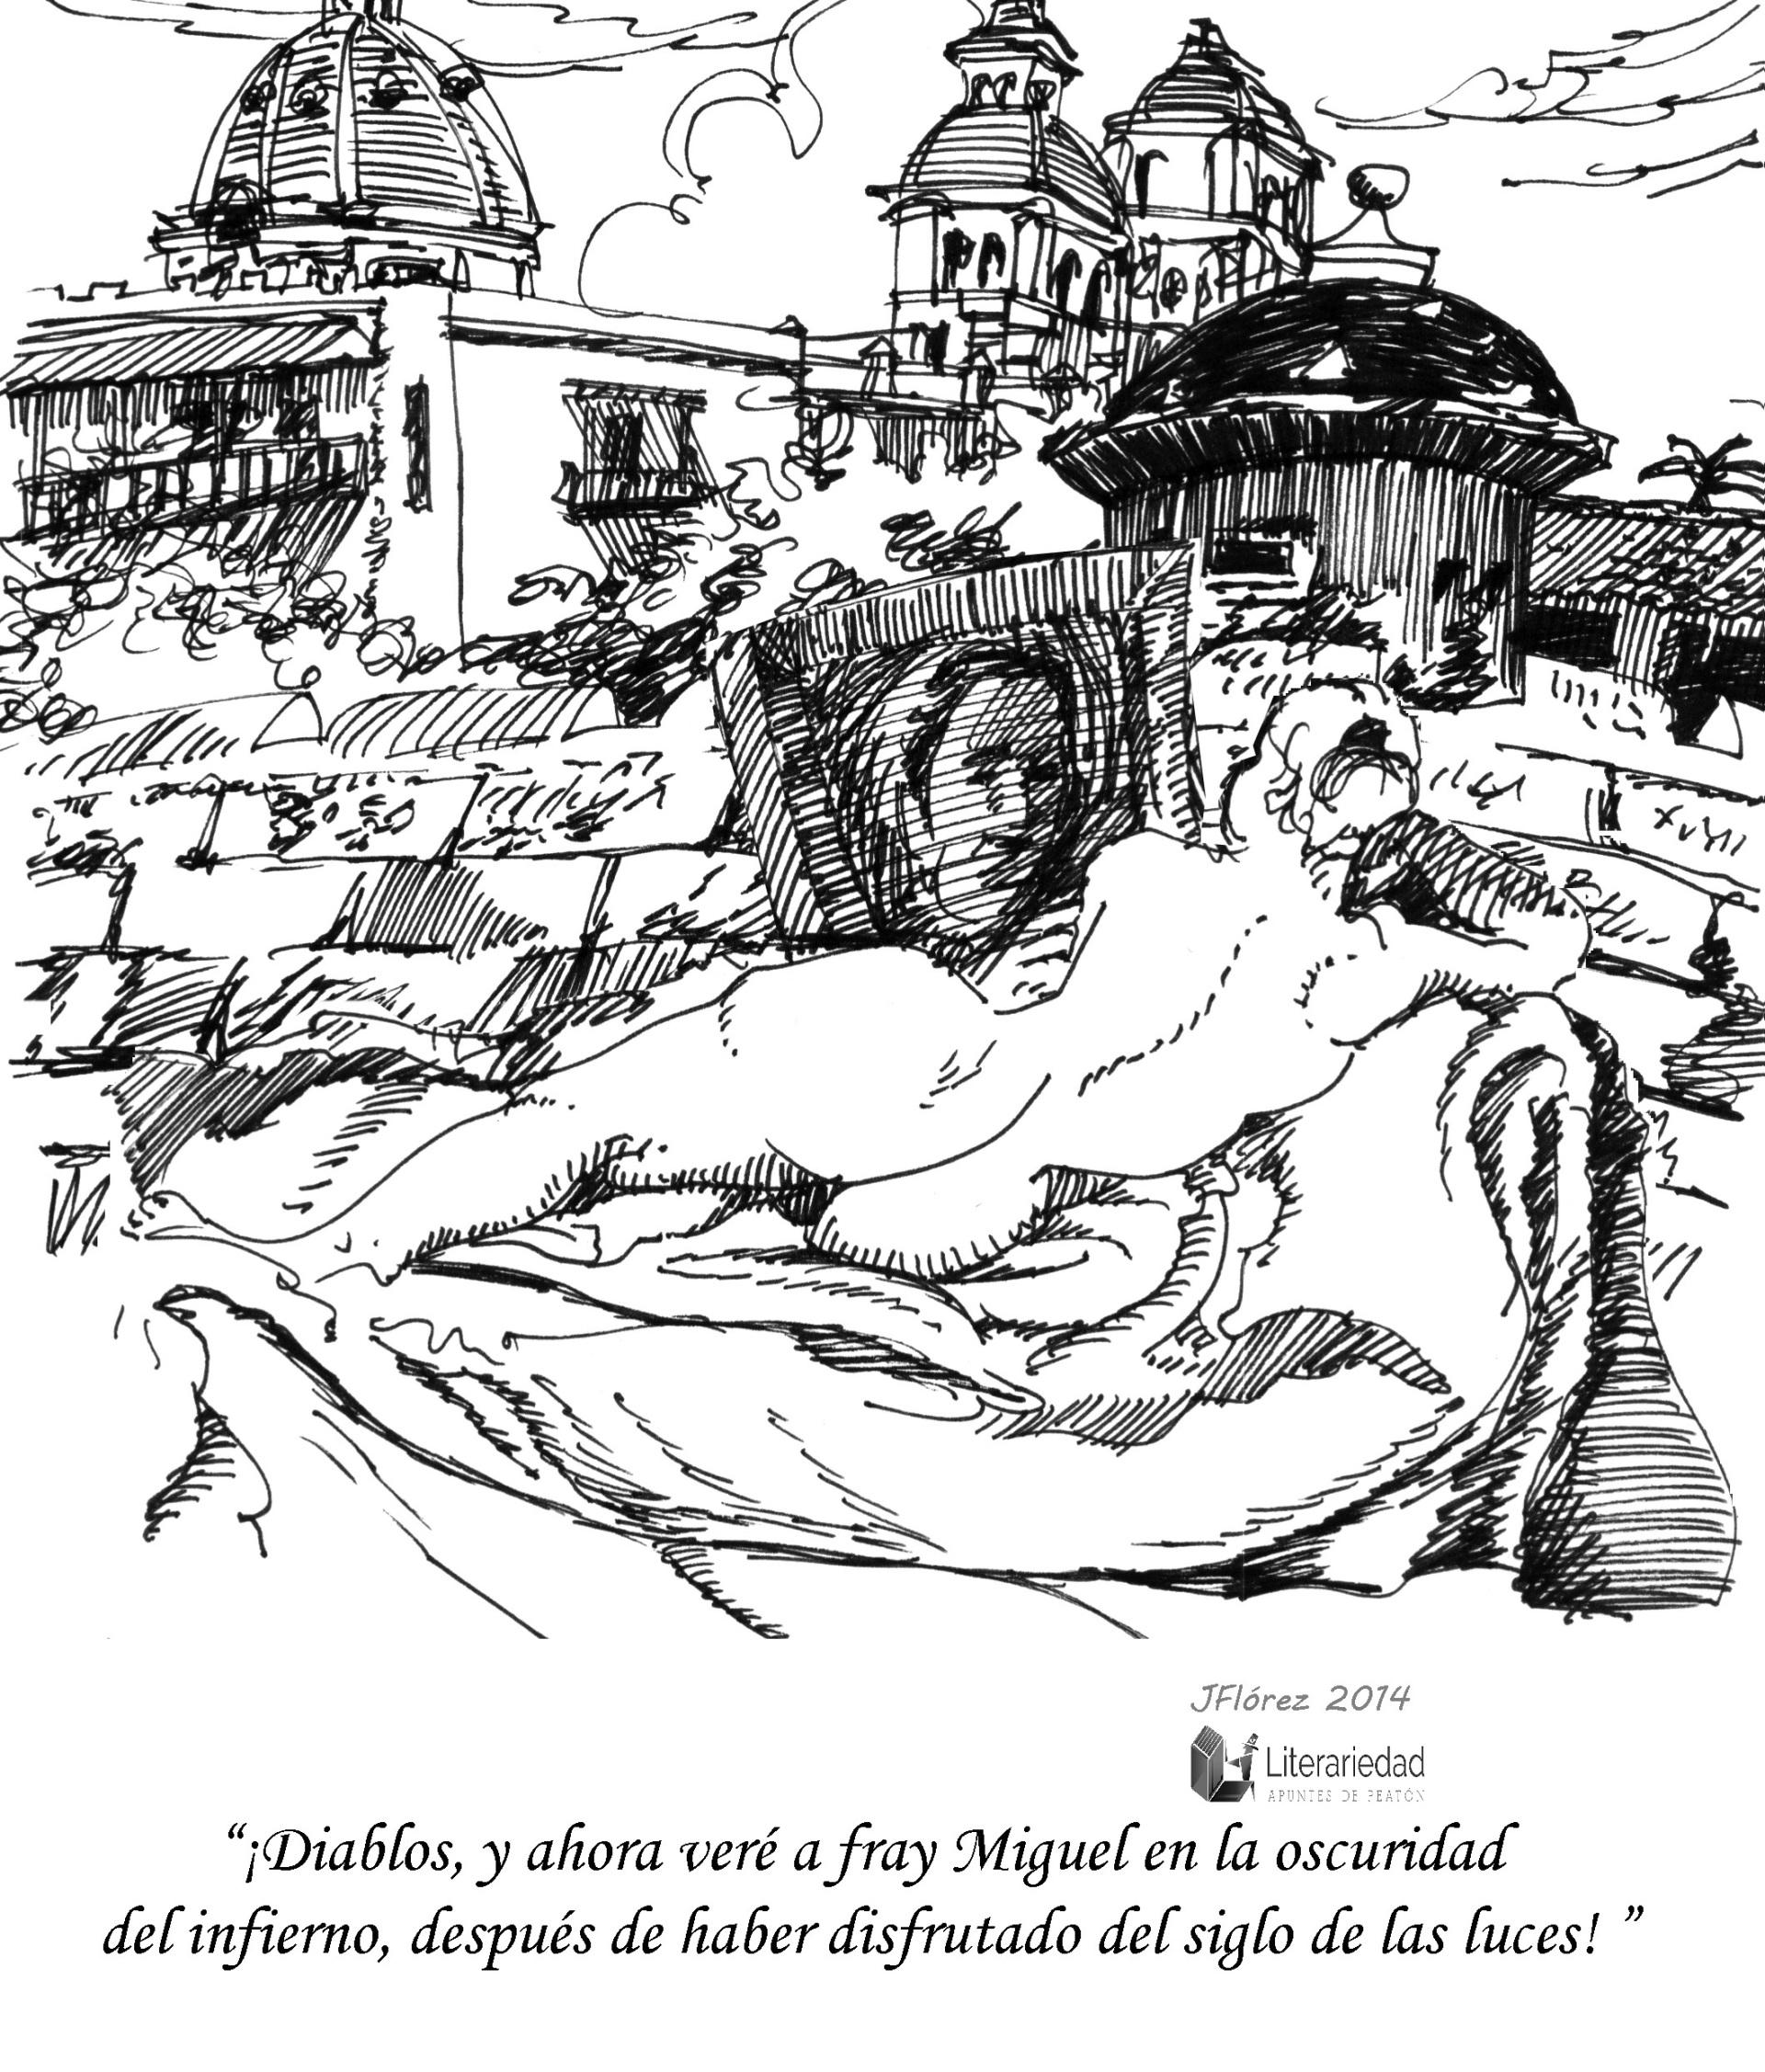 Por: Jorge Flórez Herrera